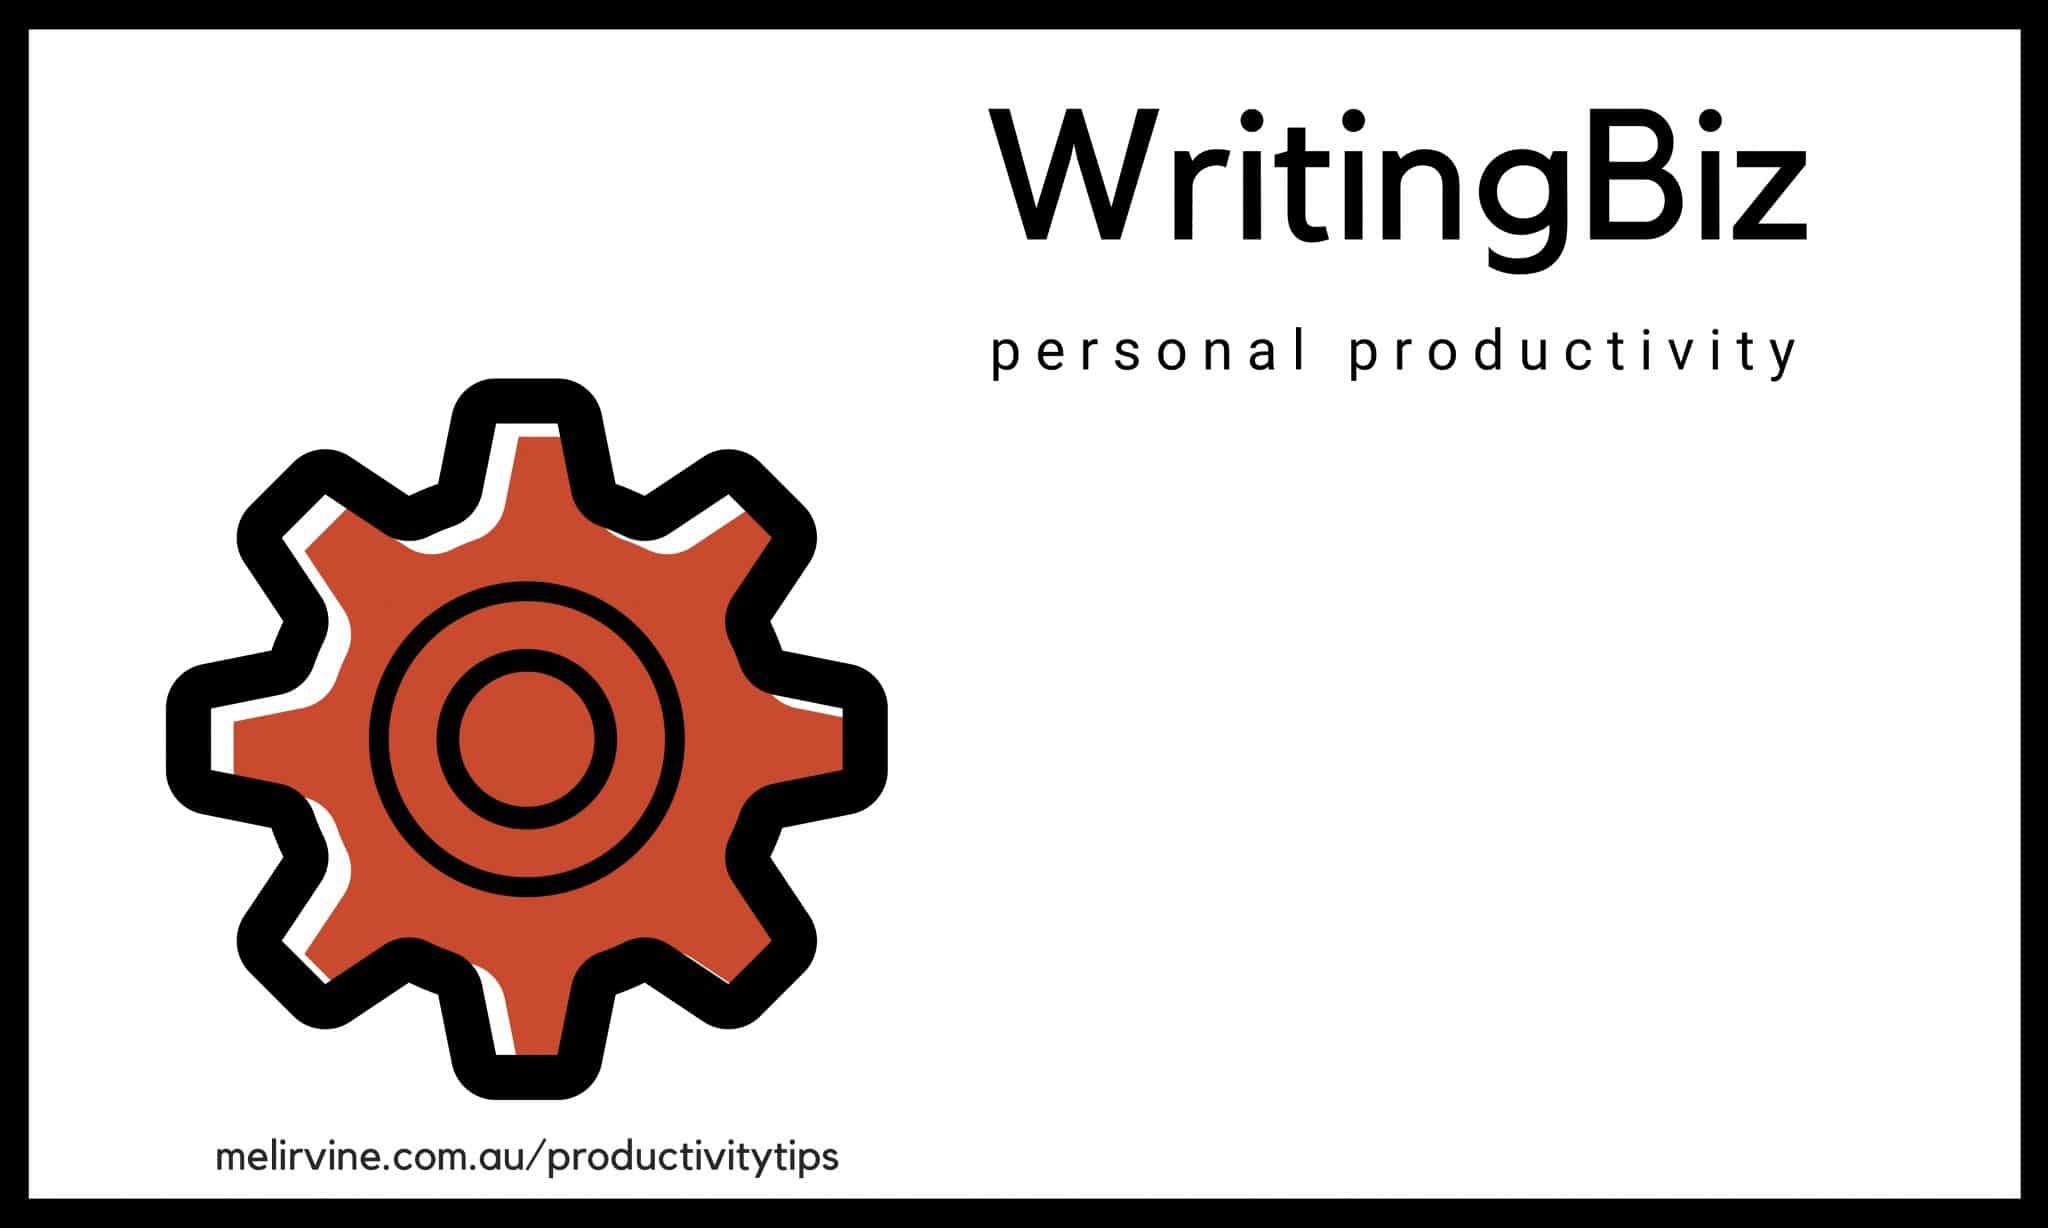 personal productivity tips @ writingbiz and Melinda J. Irvine